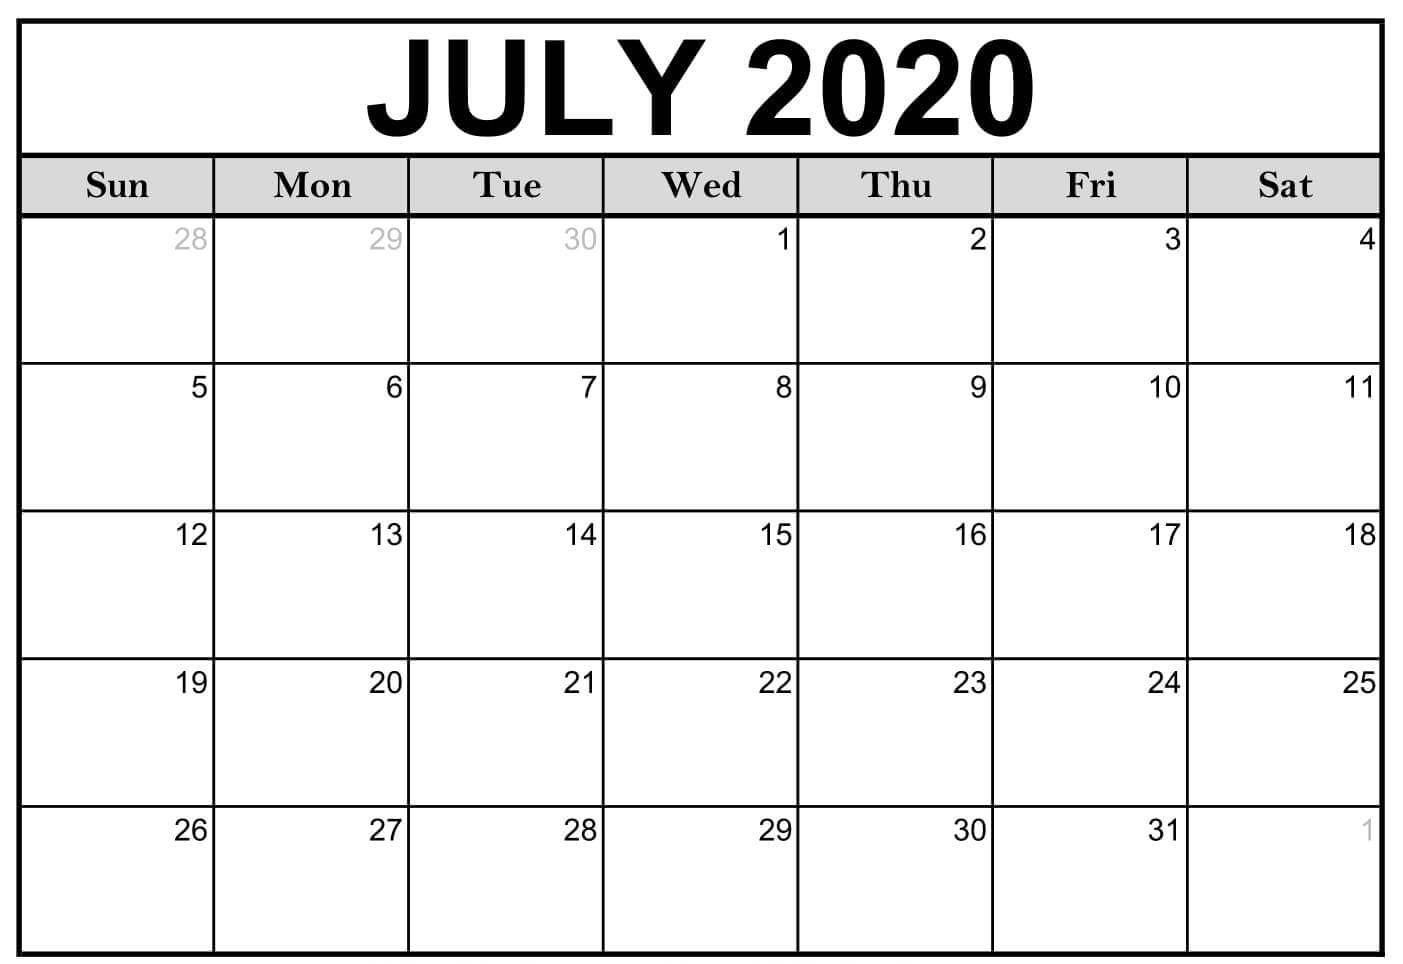 July 2020 Calendar Template Excel